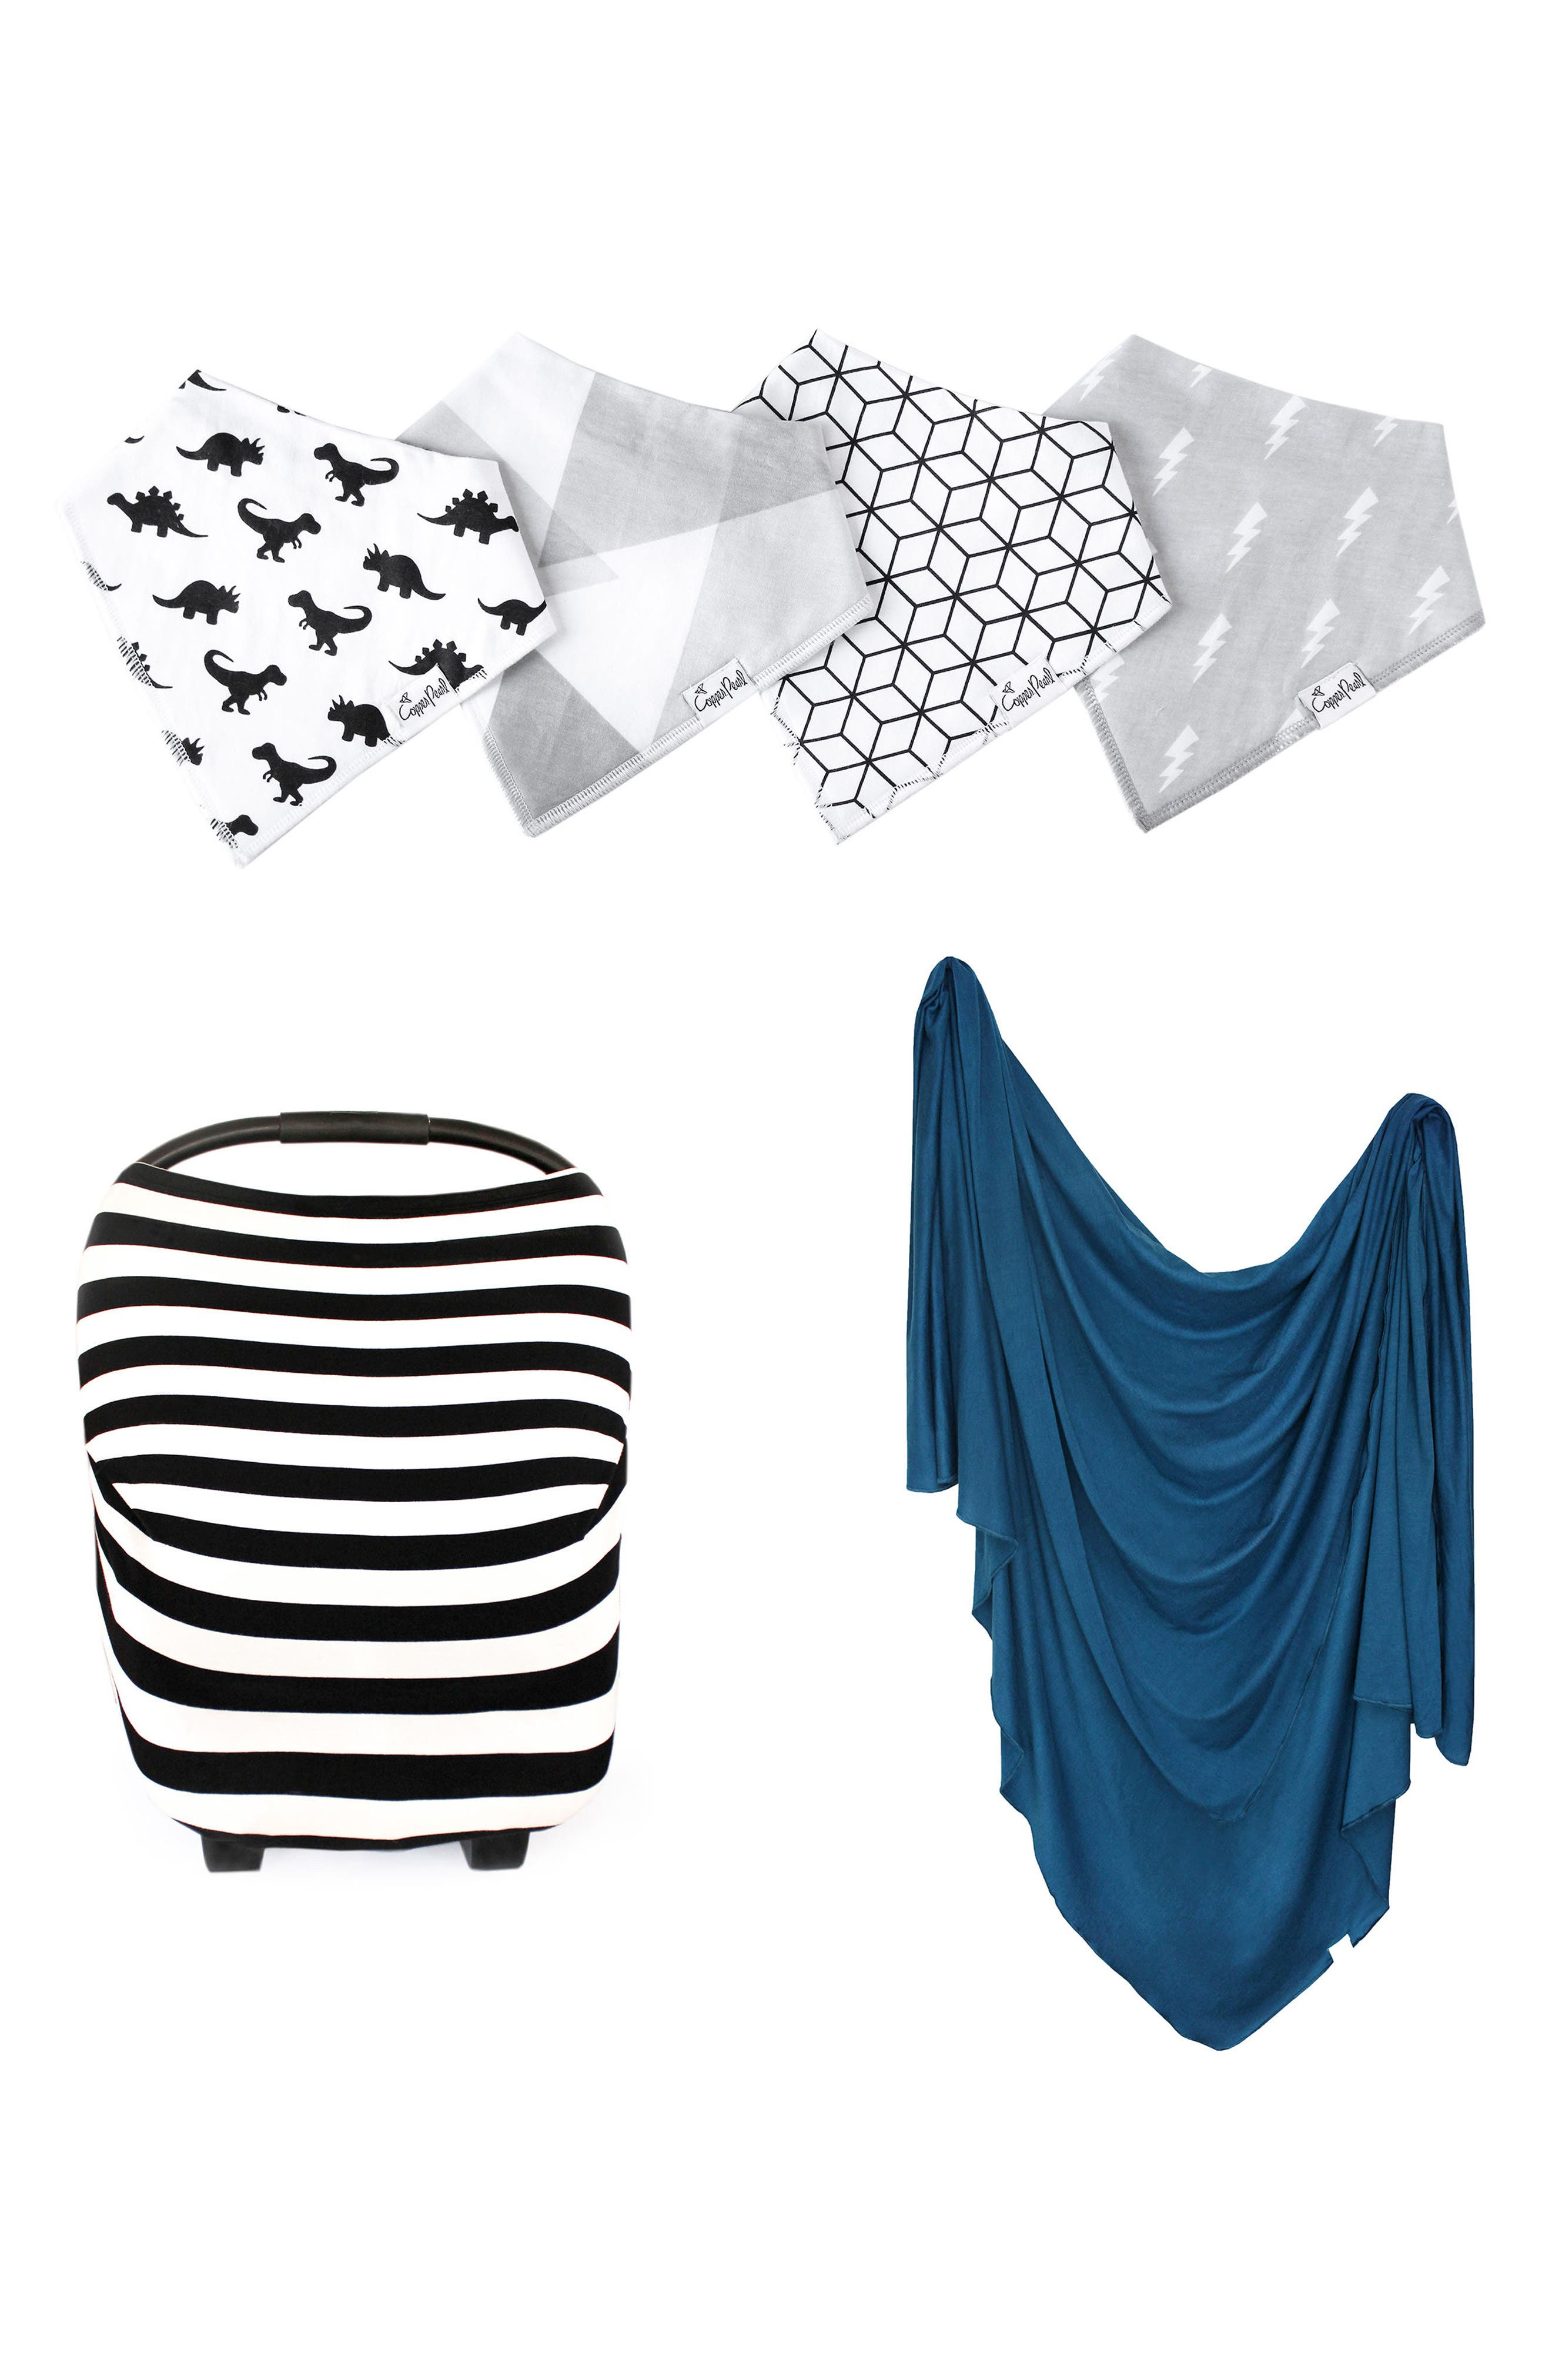 Infant Copper Pearl River Bib Multiuse Cover  Swaddle Blanket Gift Set